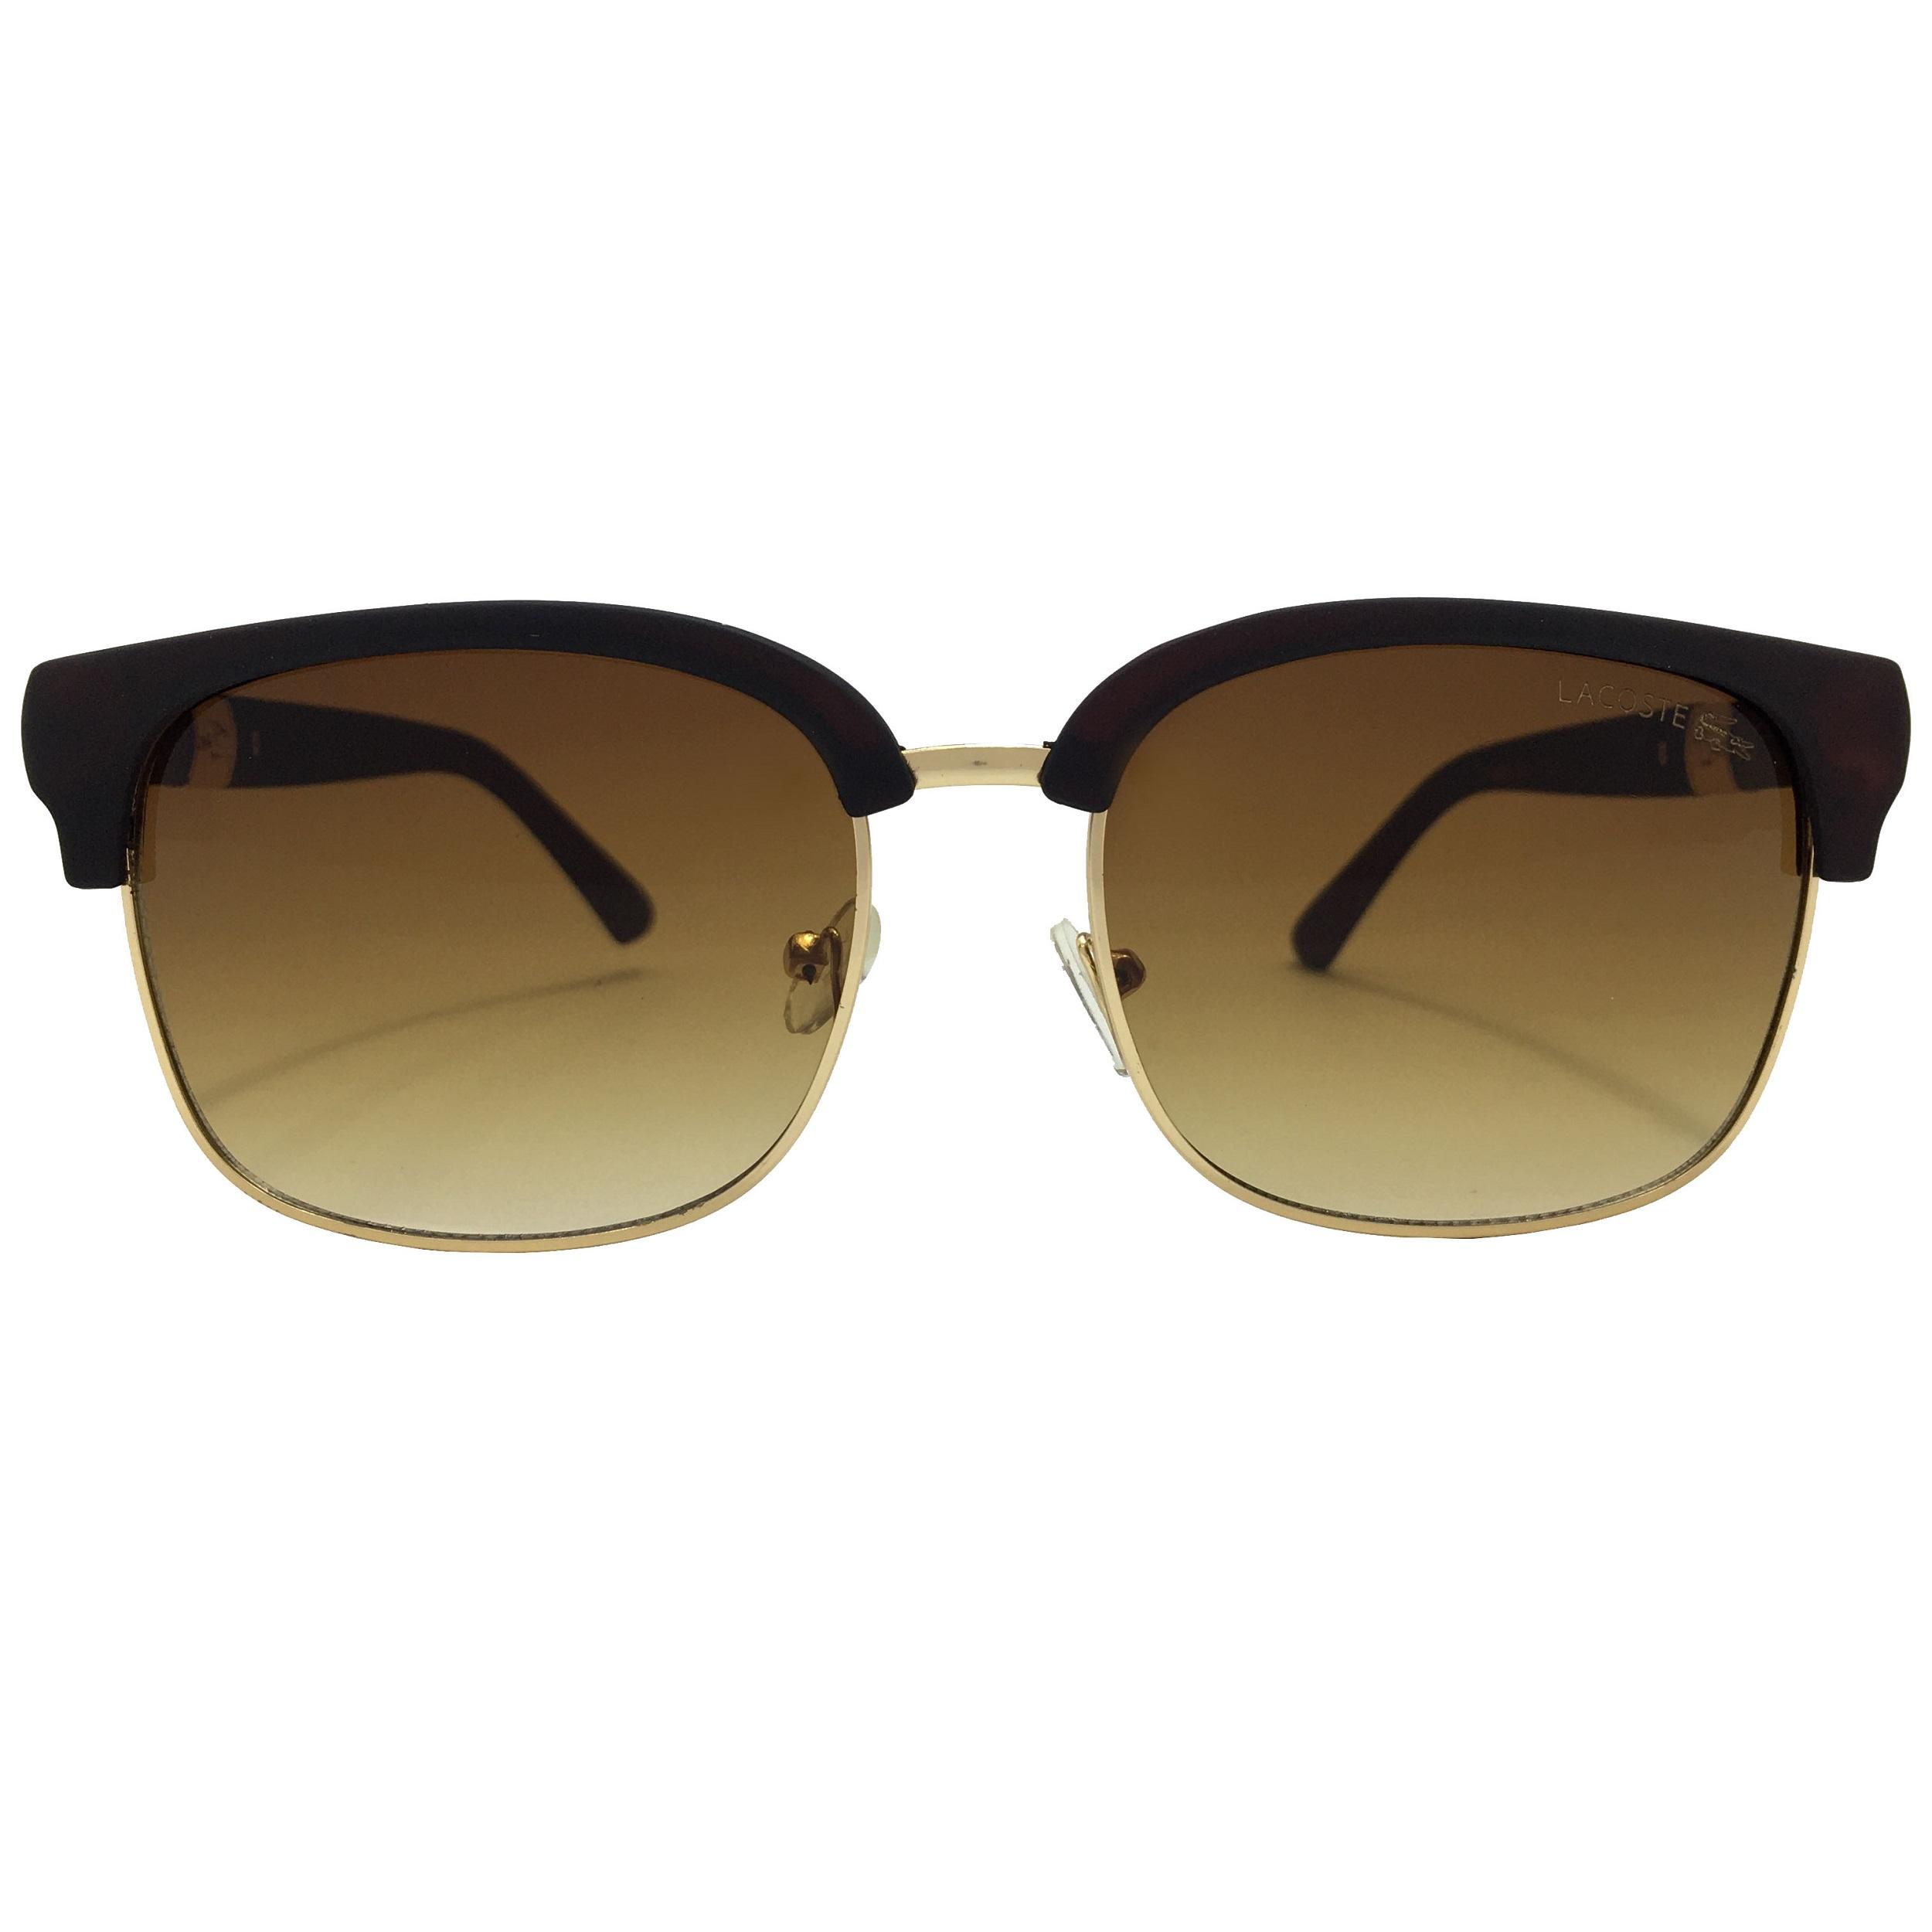 عینک آفتابی  مدل 16854                     غیر اصل